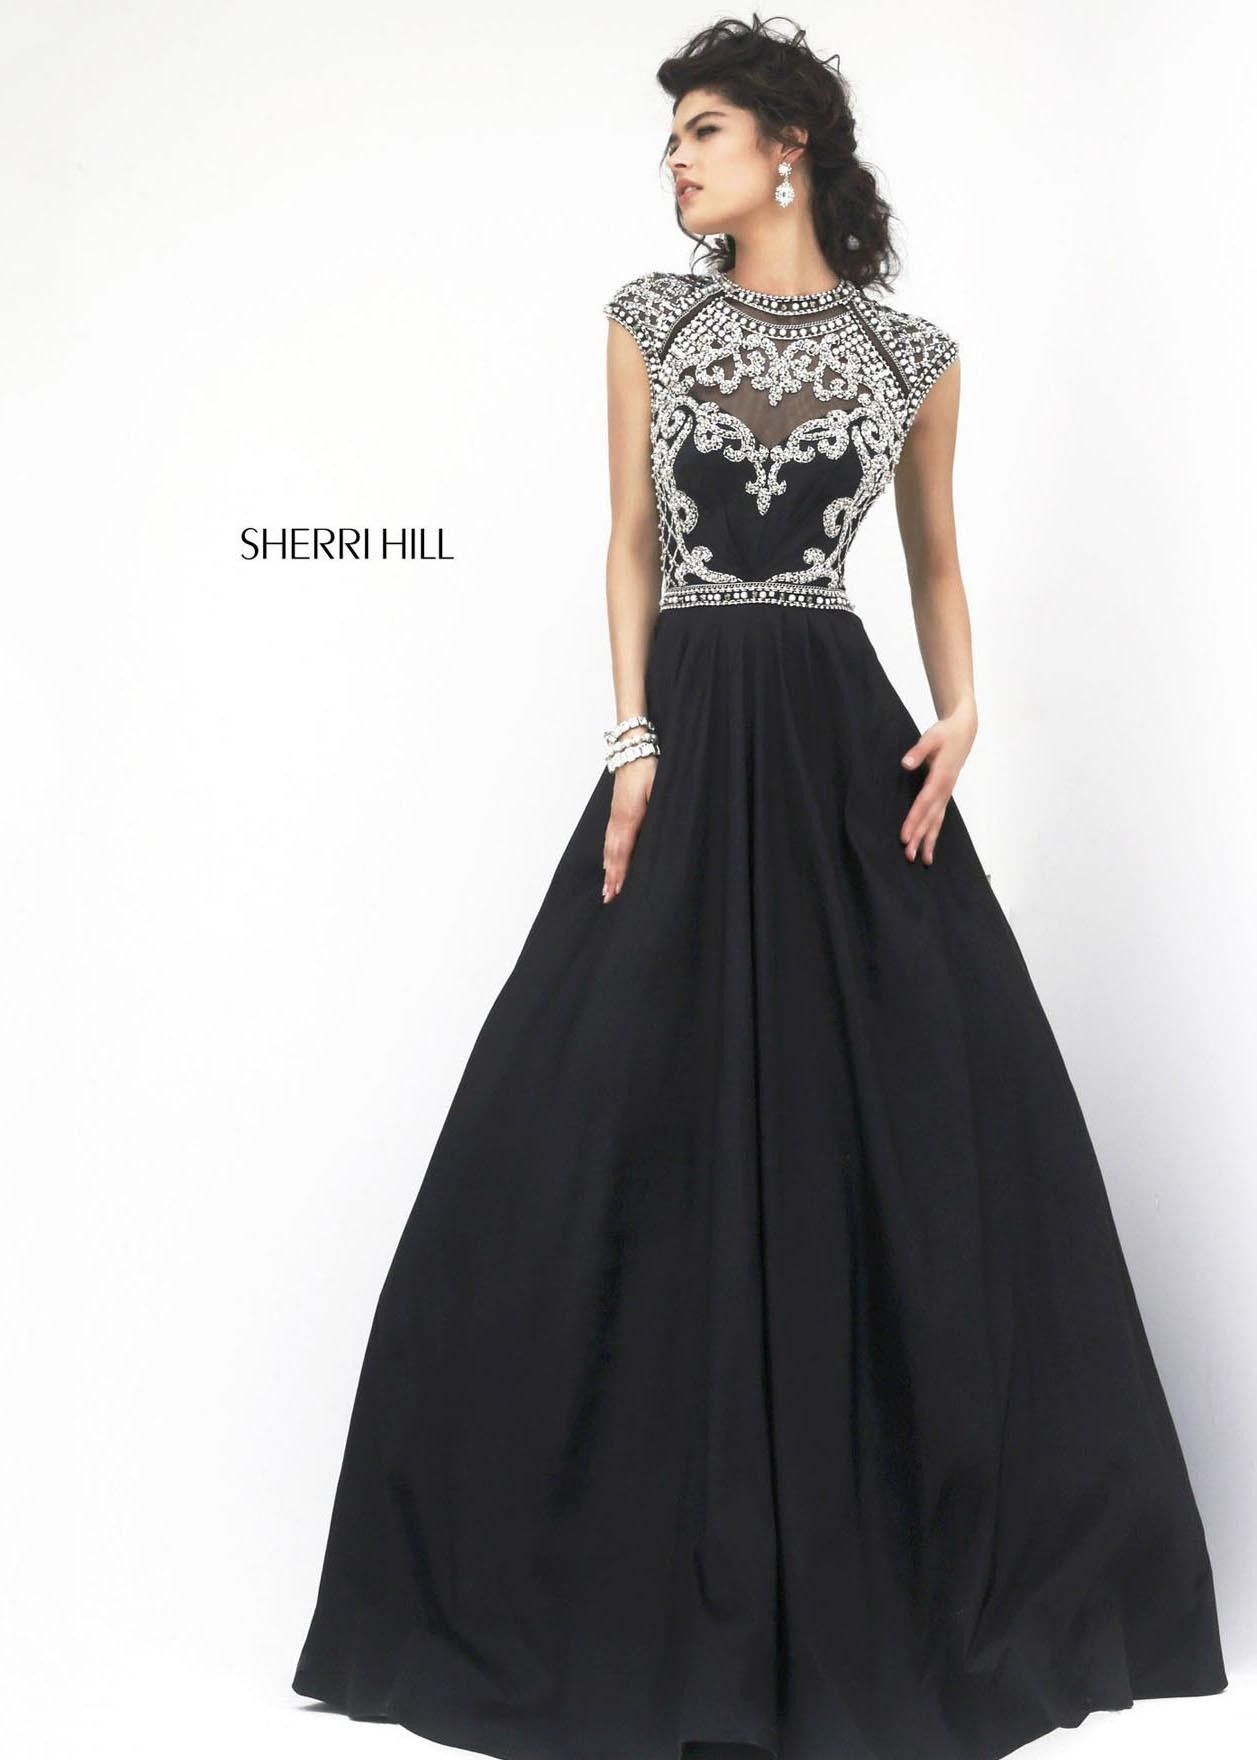 Sherri Hill 4332 Enchanting Evening Gown   dresses   Pinterest ...